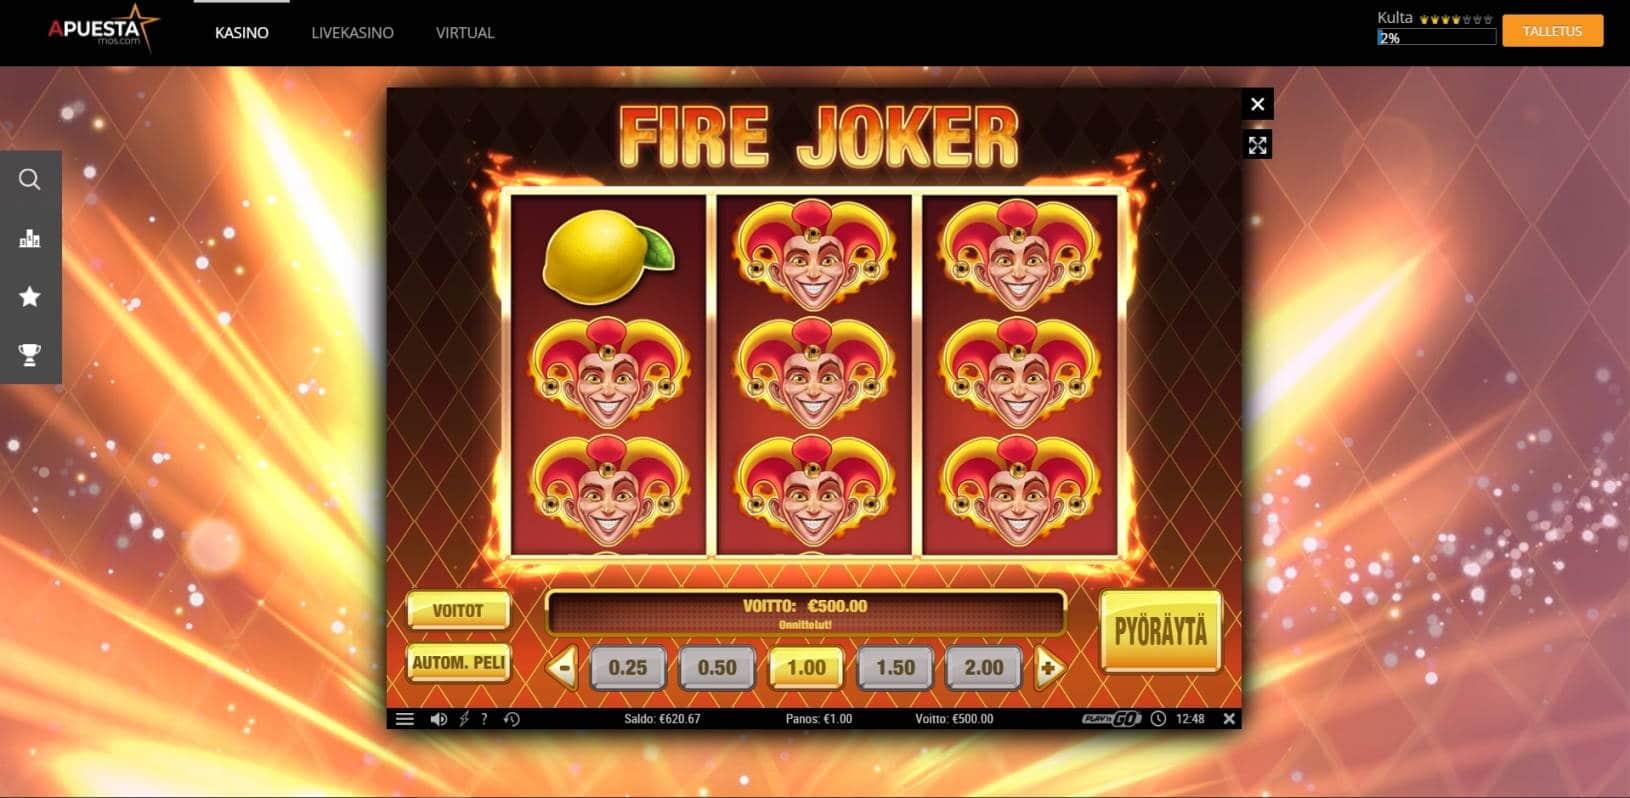 Fire Joker Casino win picture by jube 9.8.2021 500e 500X APuesta